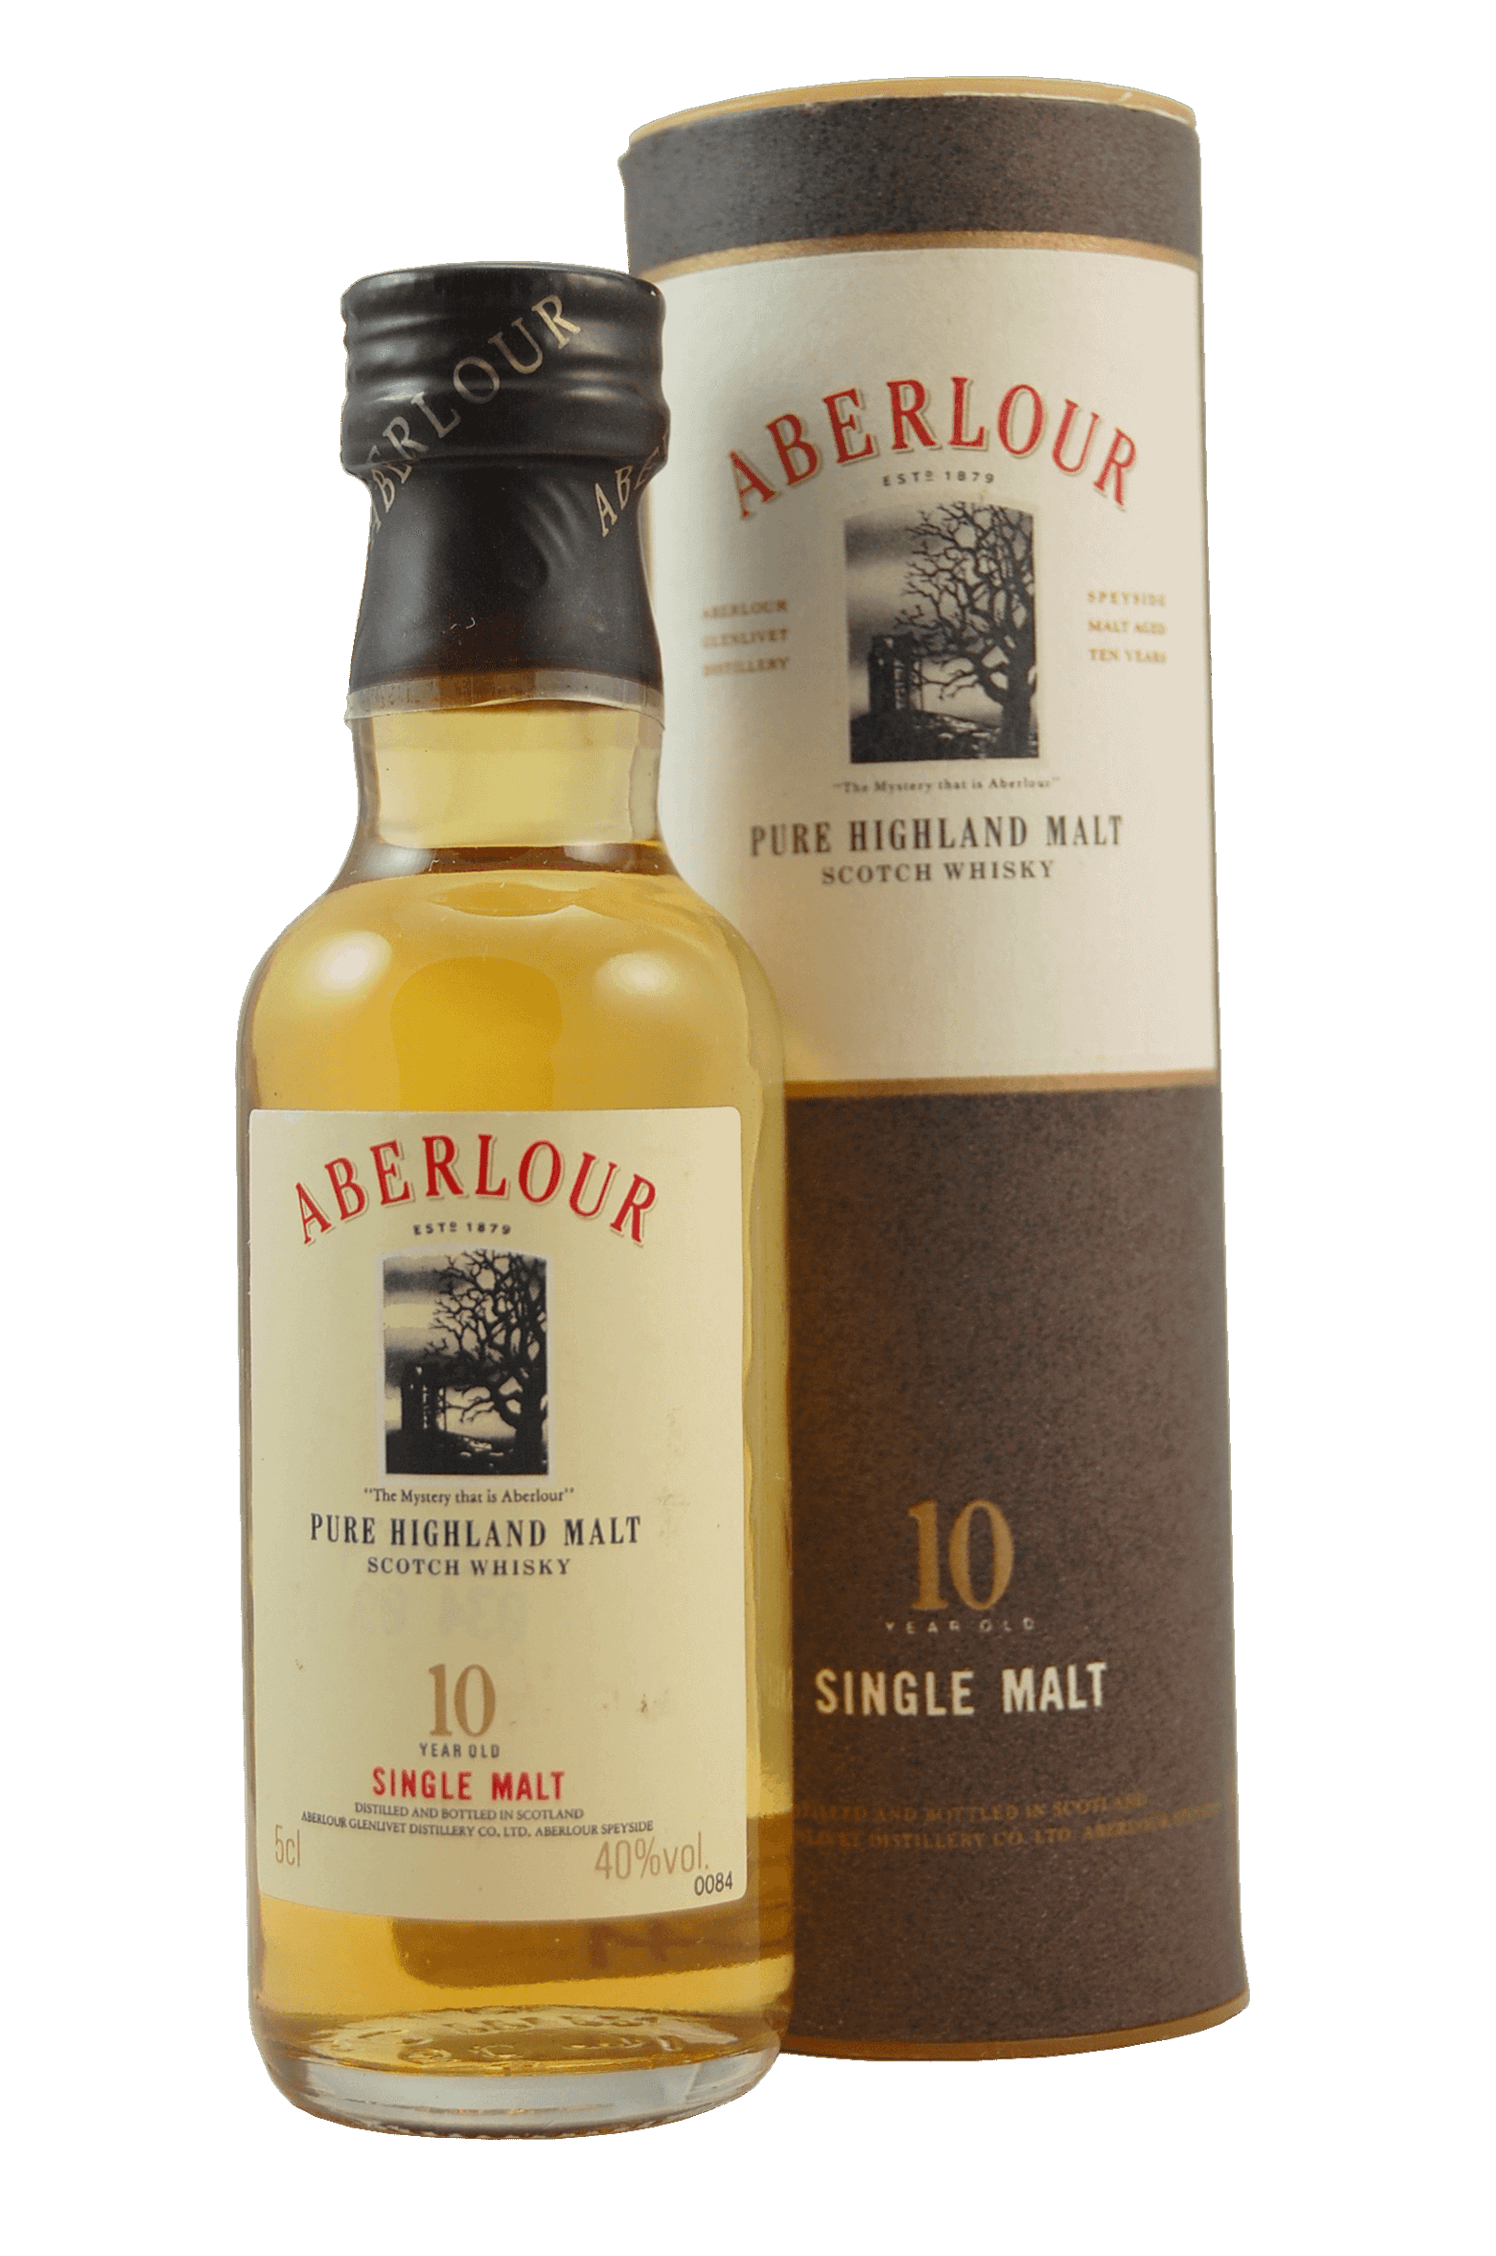 Aberlour Pure Highland Malt